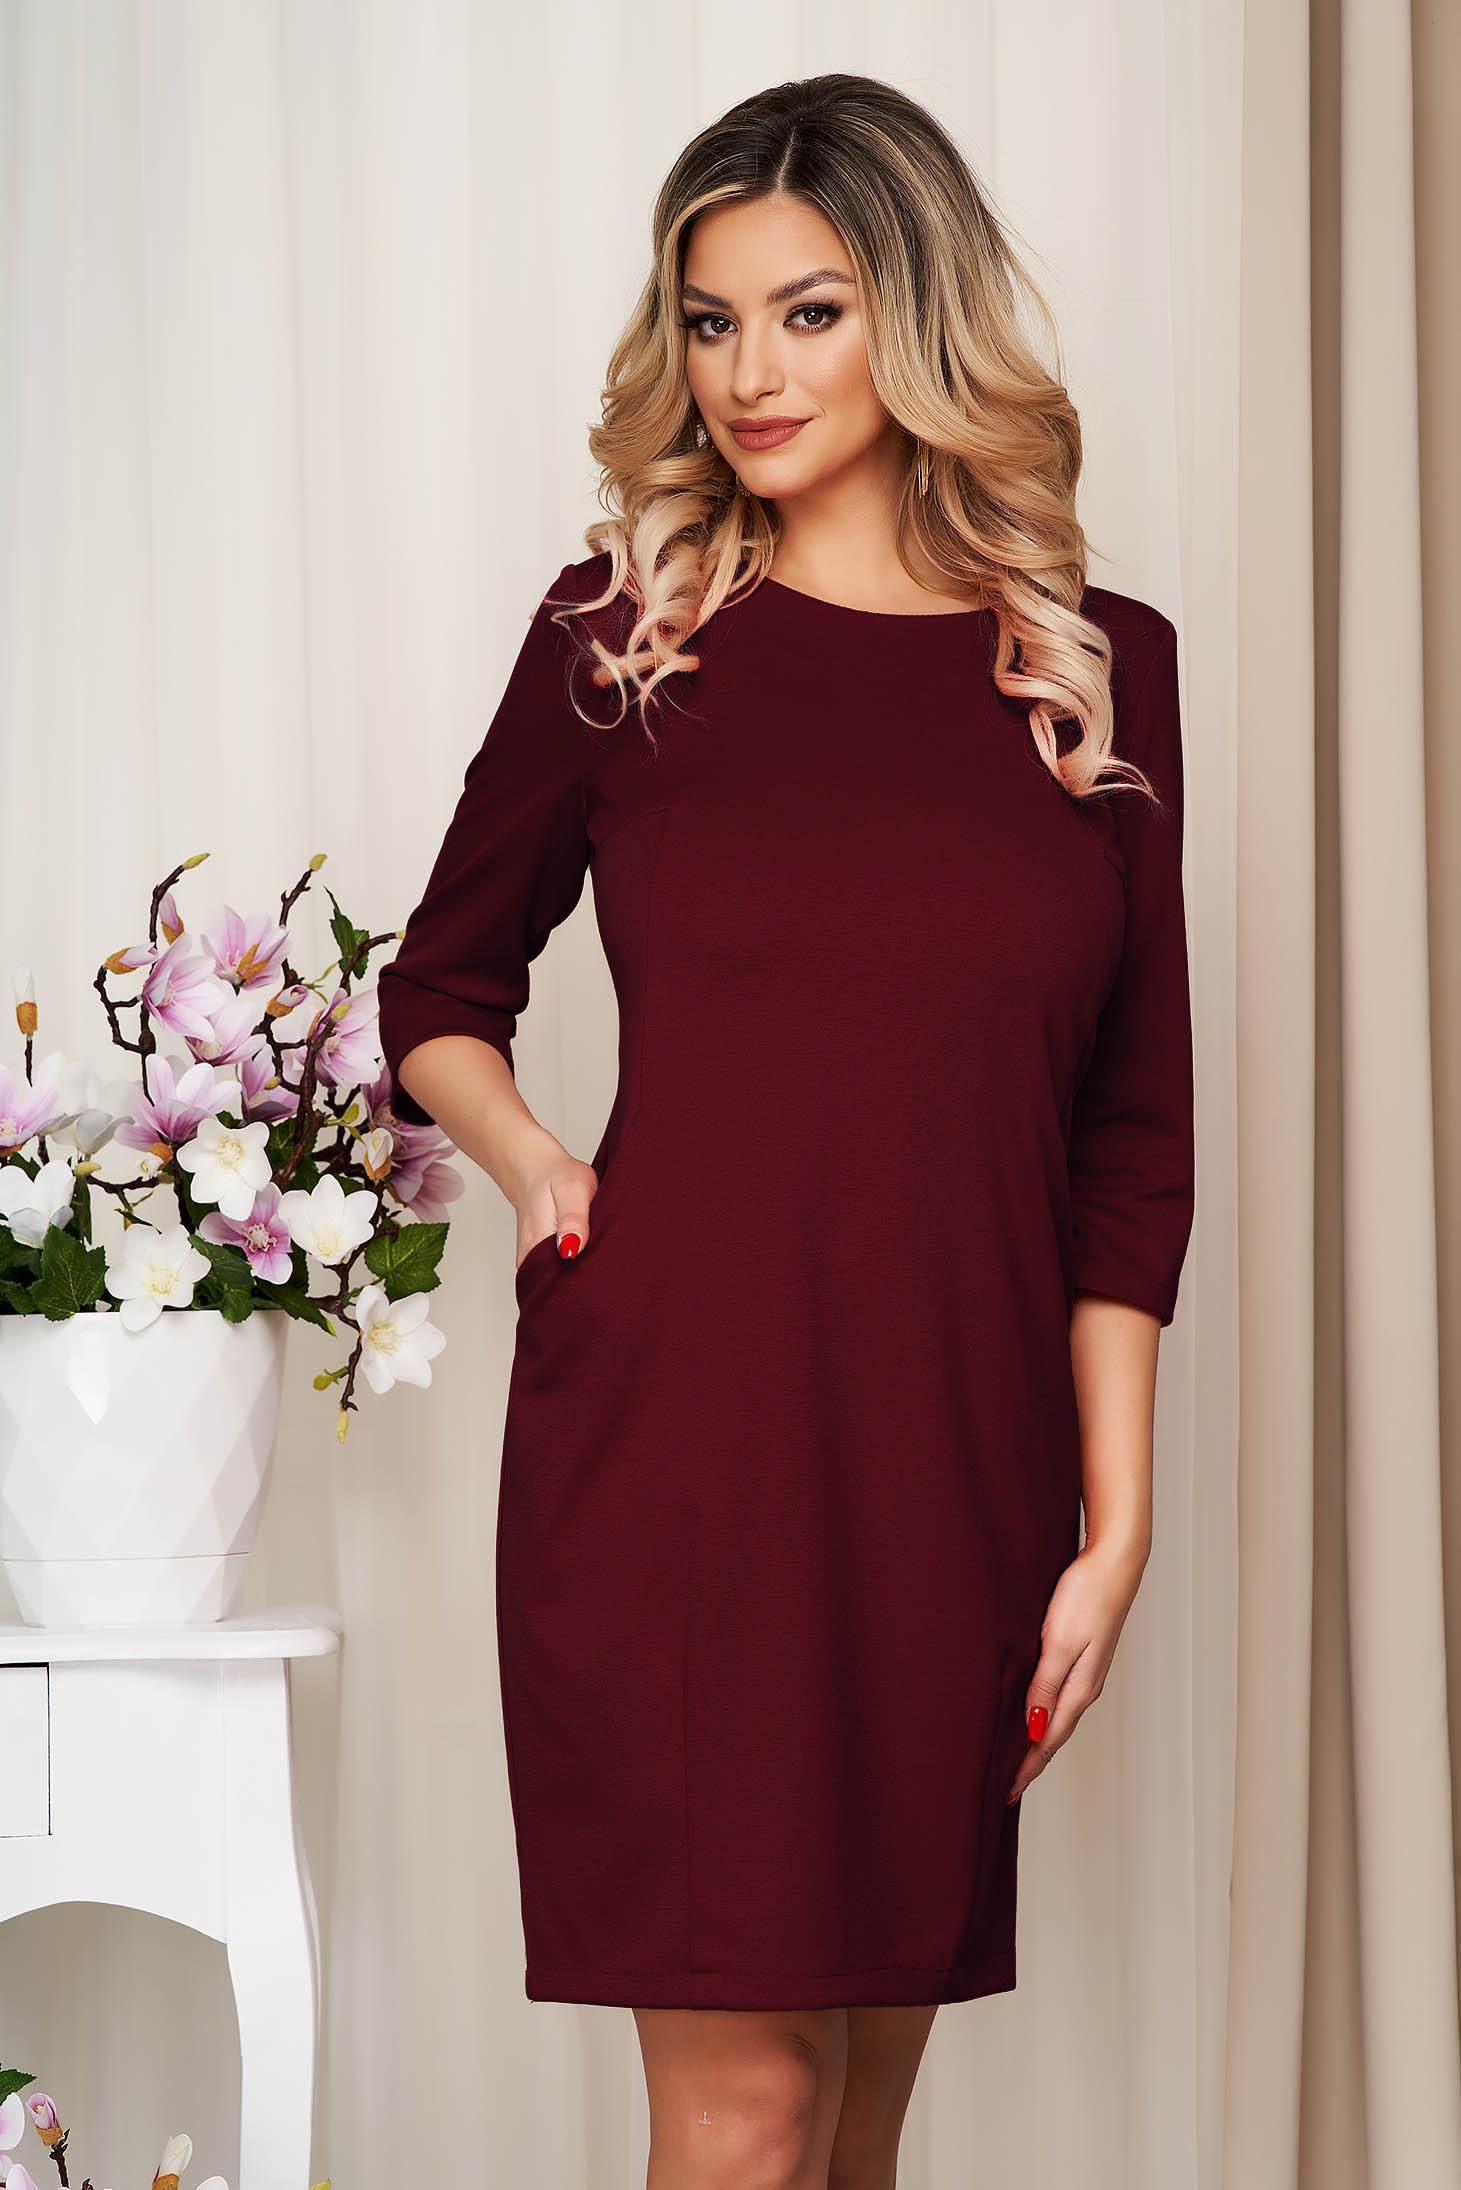 Dress burgundy office slightly elastic fabric straight with pockets